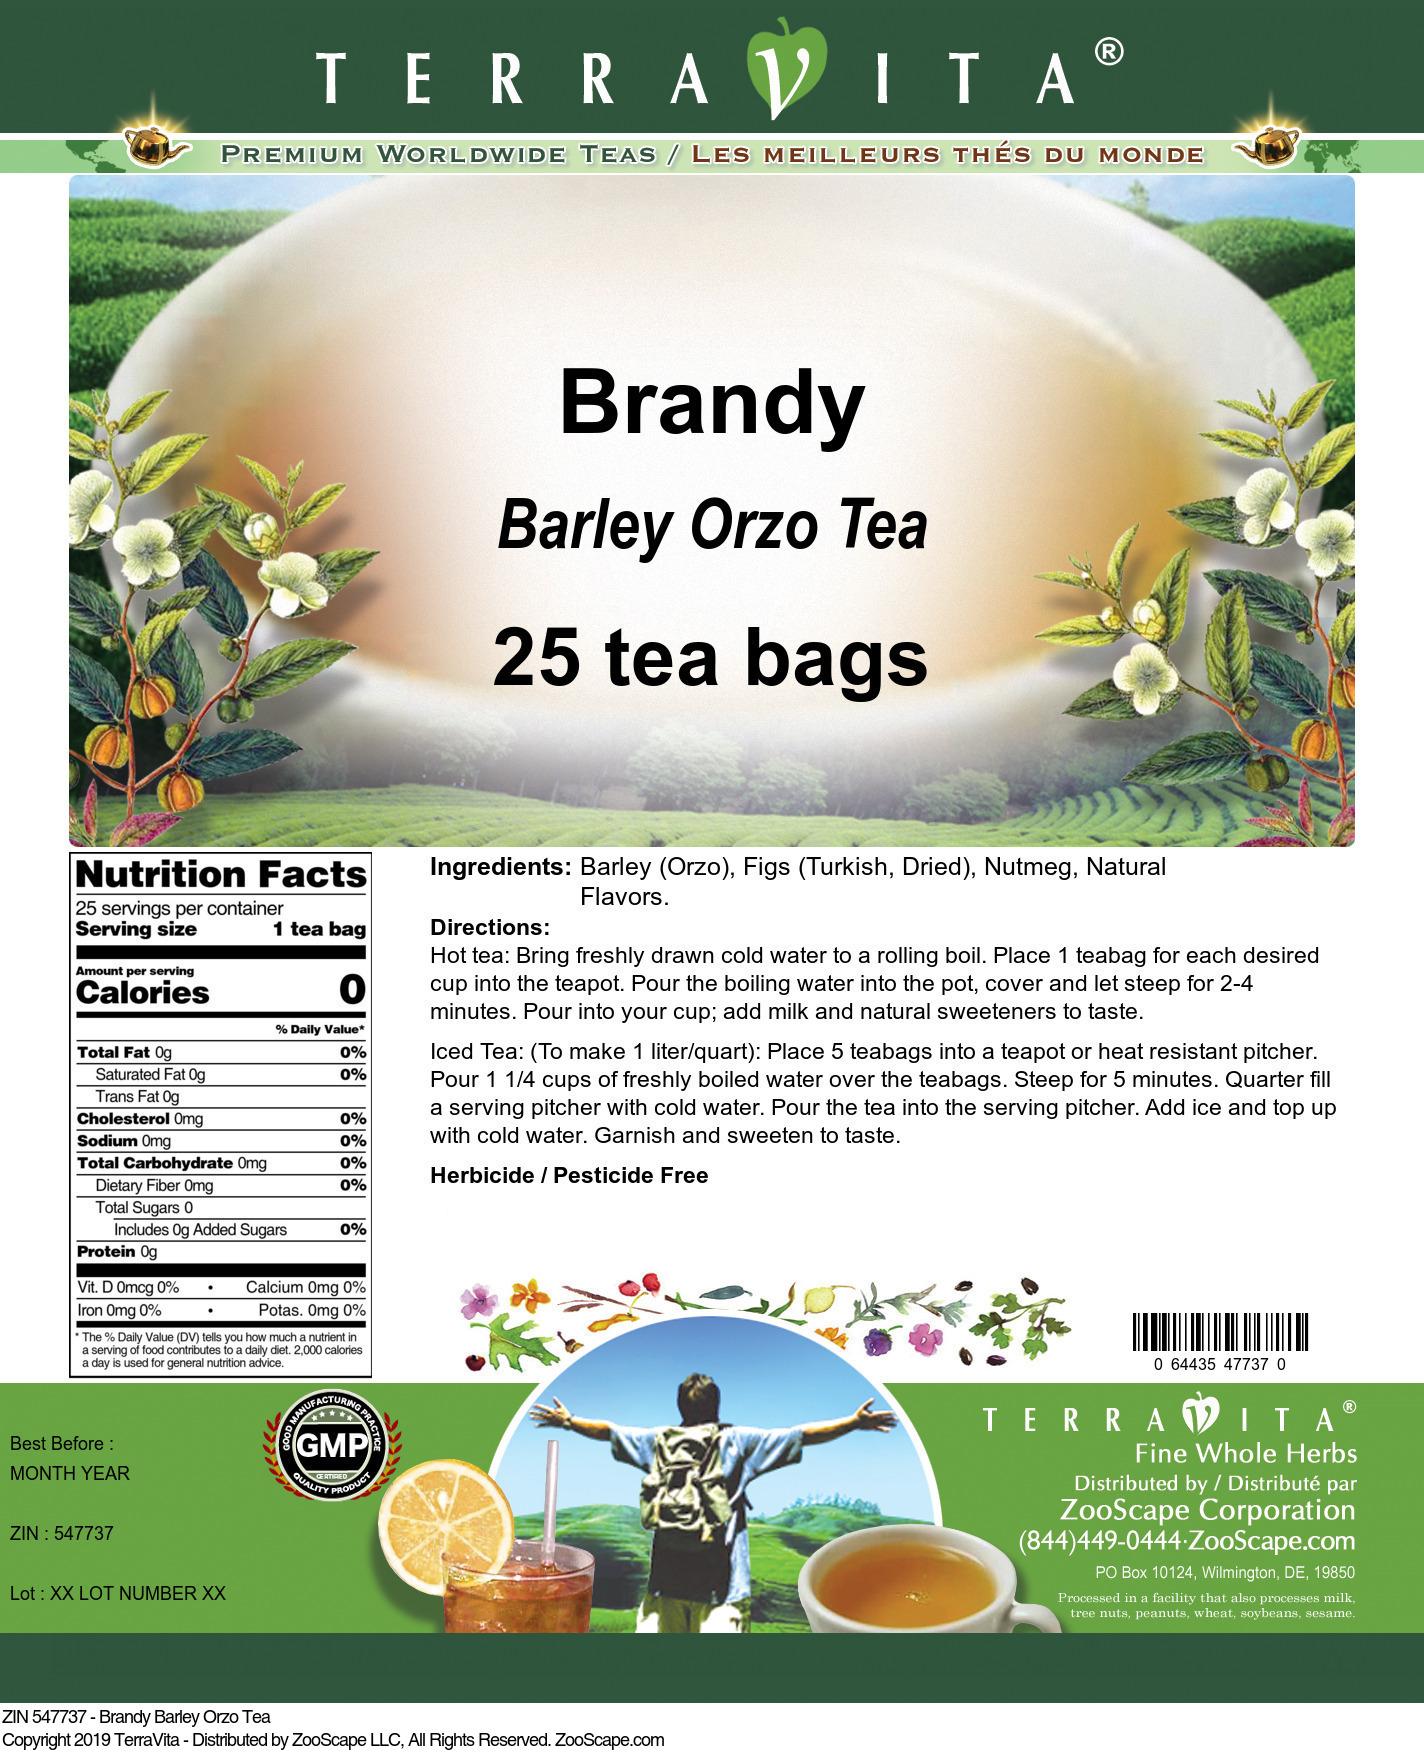 Brandy Barley Orzo Tea